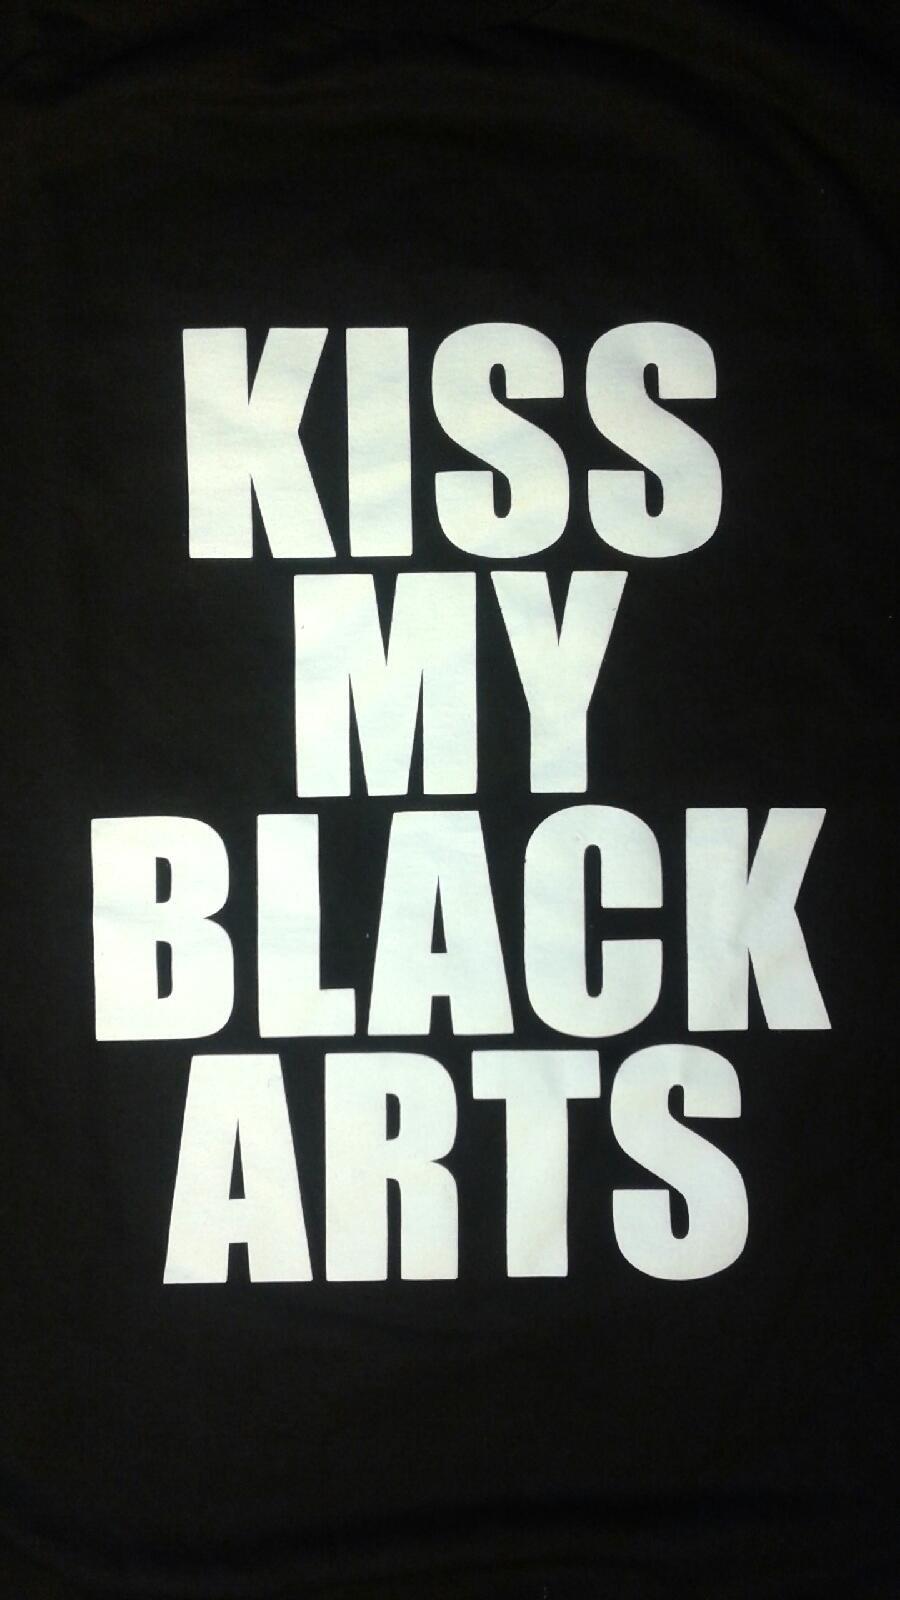 Image of Kiss My Black Arts - T shirt